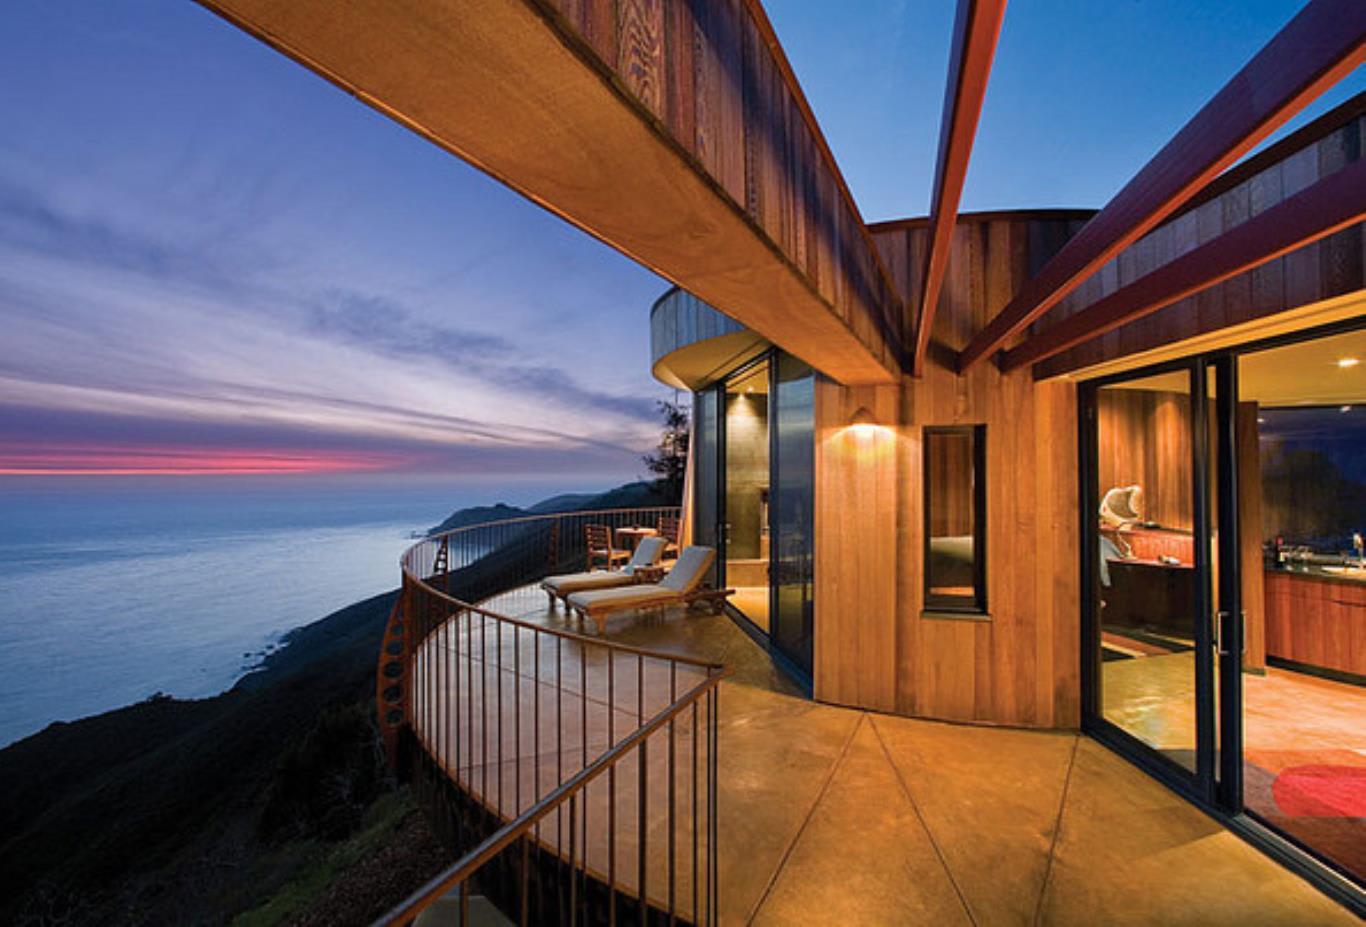 Pacific Suite balcony